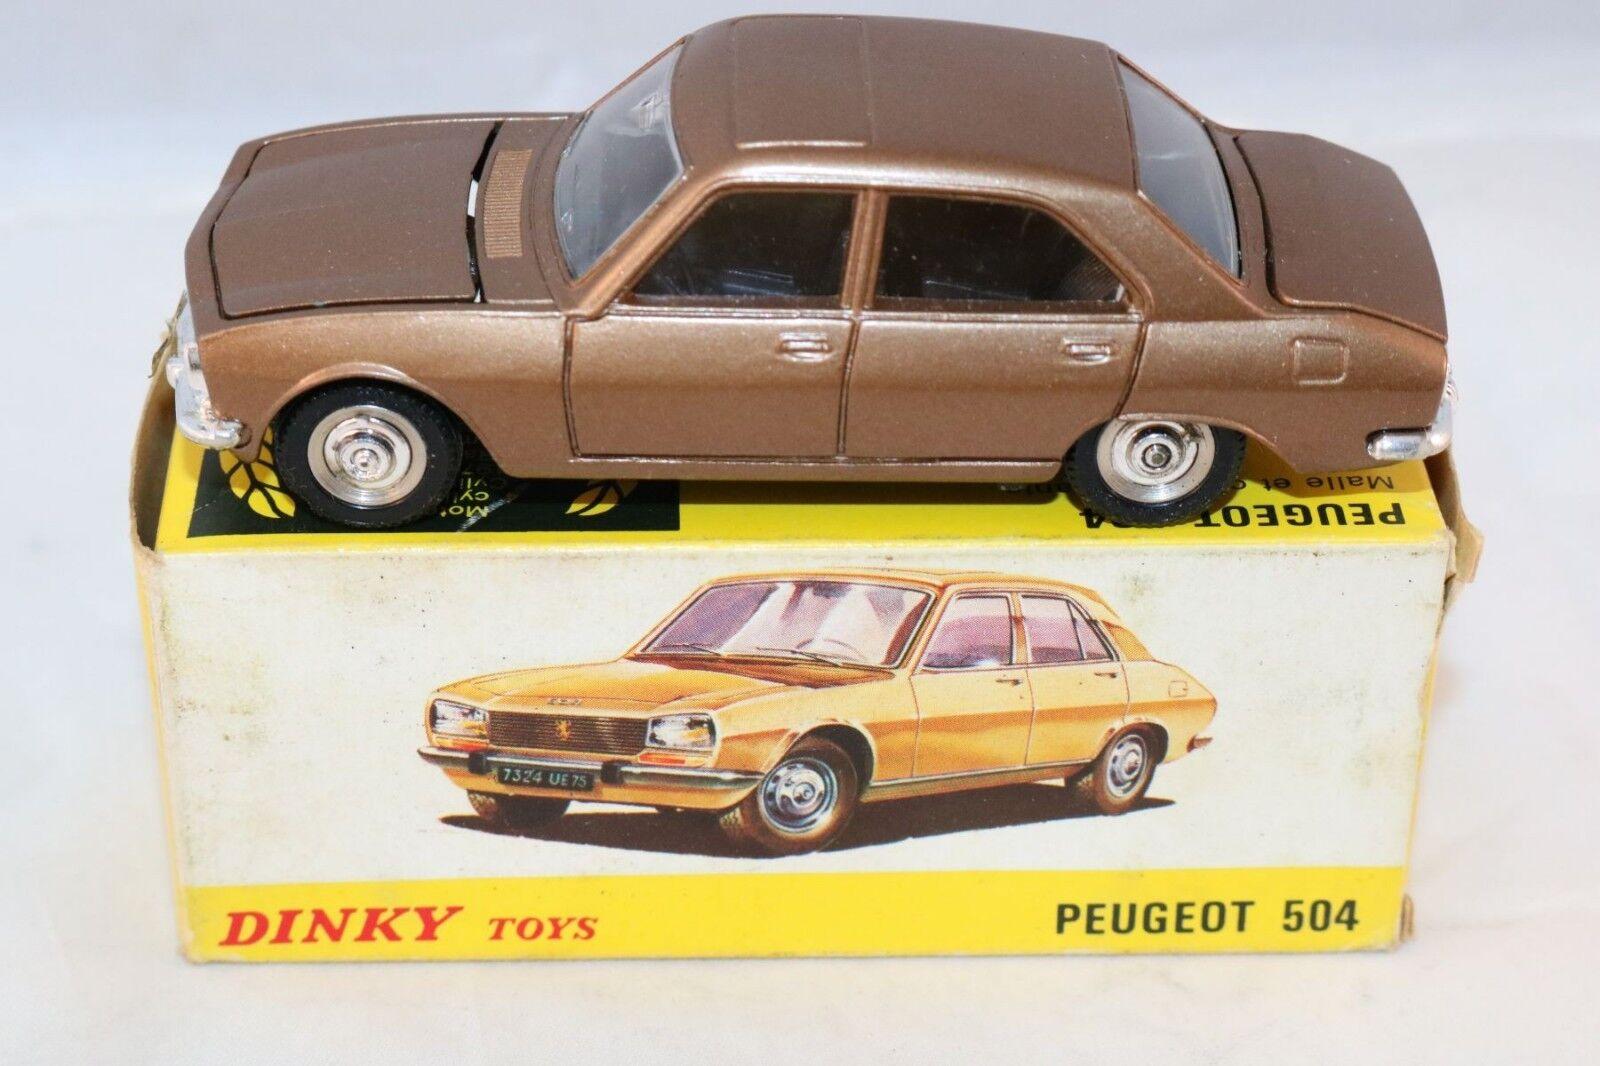 Dinky Toys 1452 Peugeot 504 bronze very near mint in box Very nice model